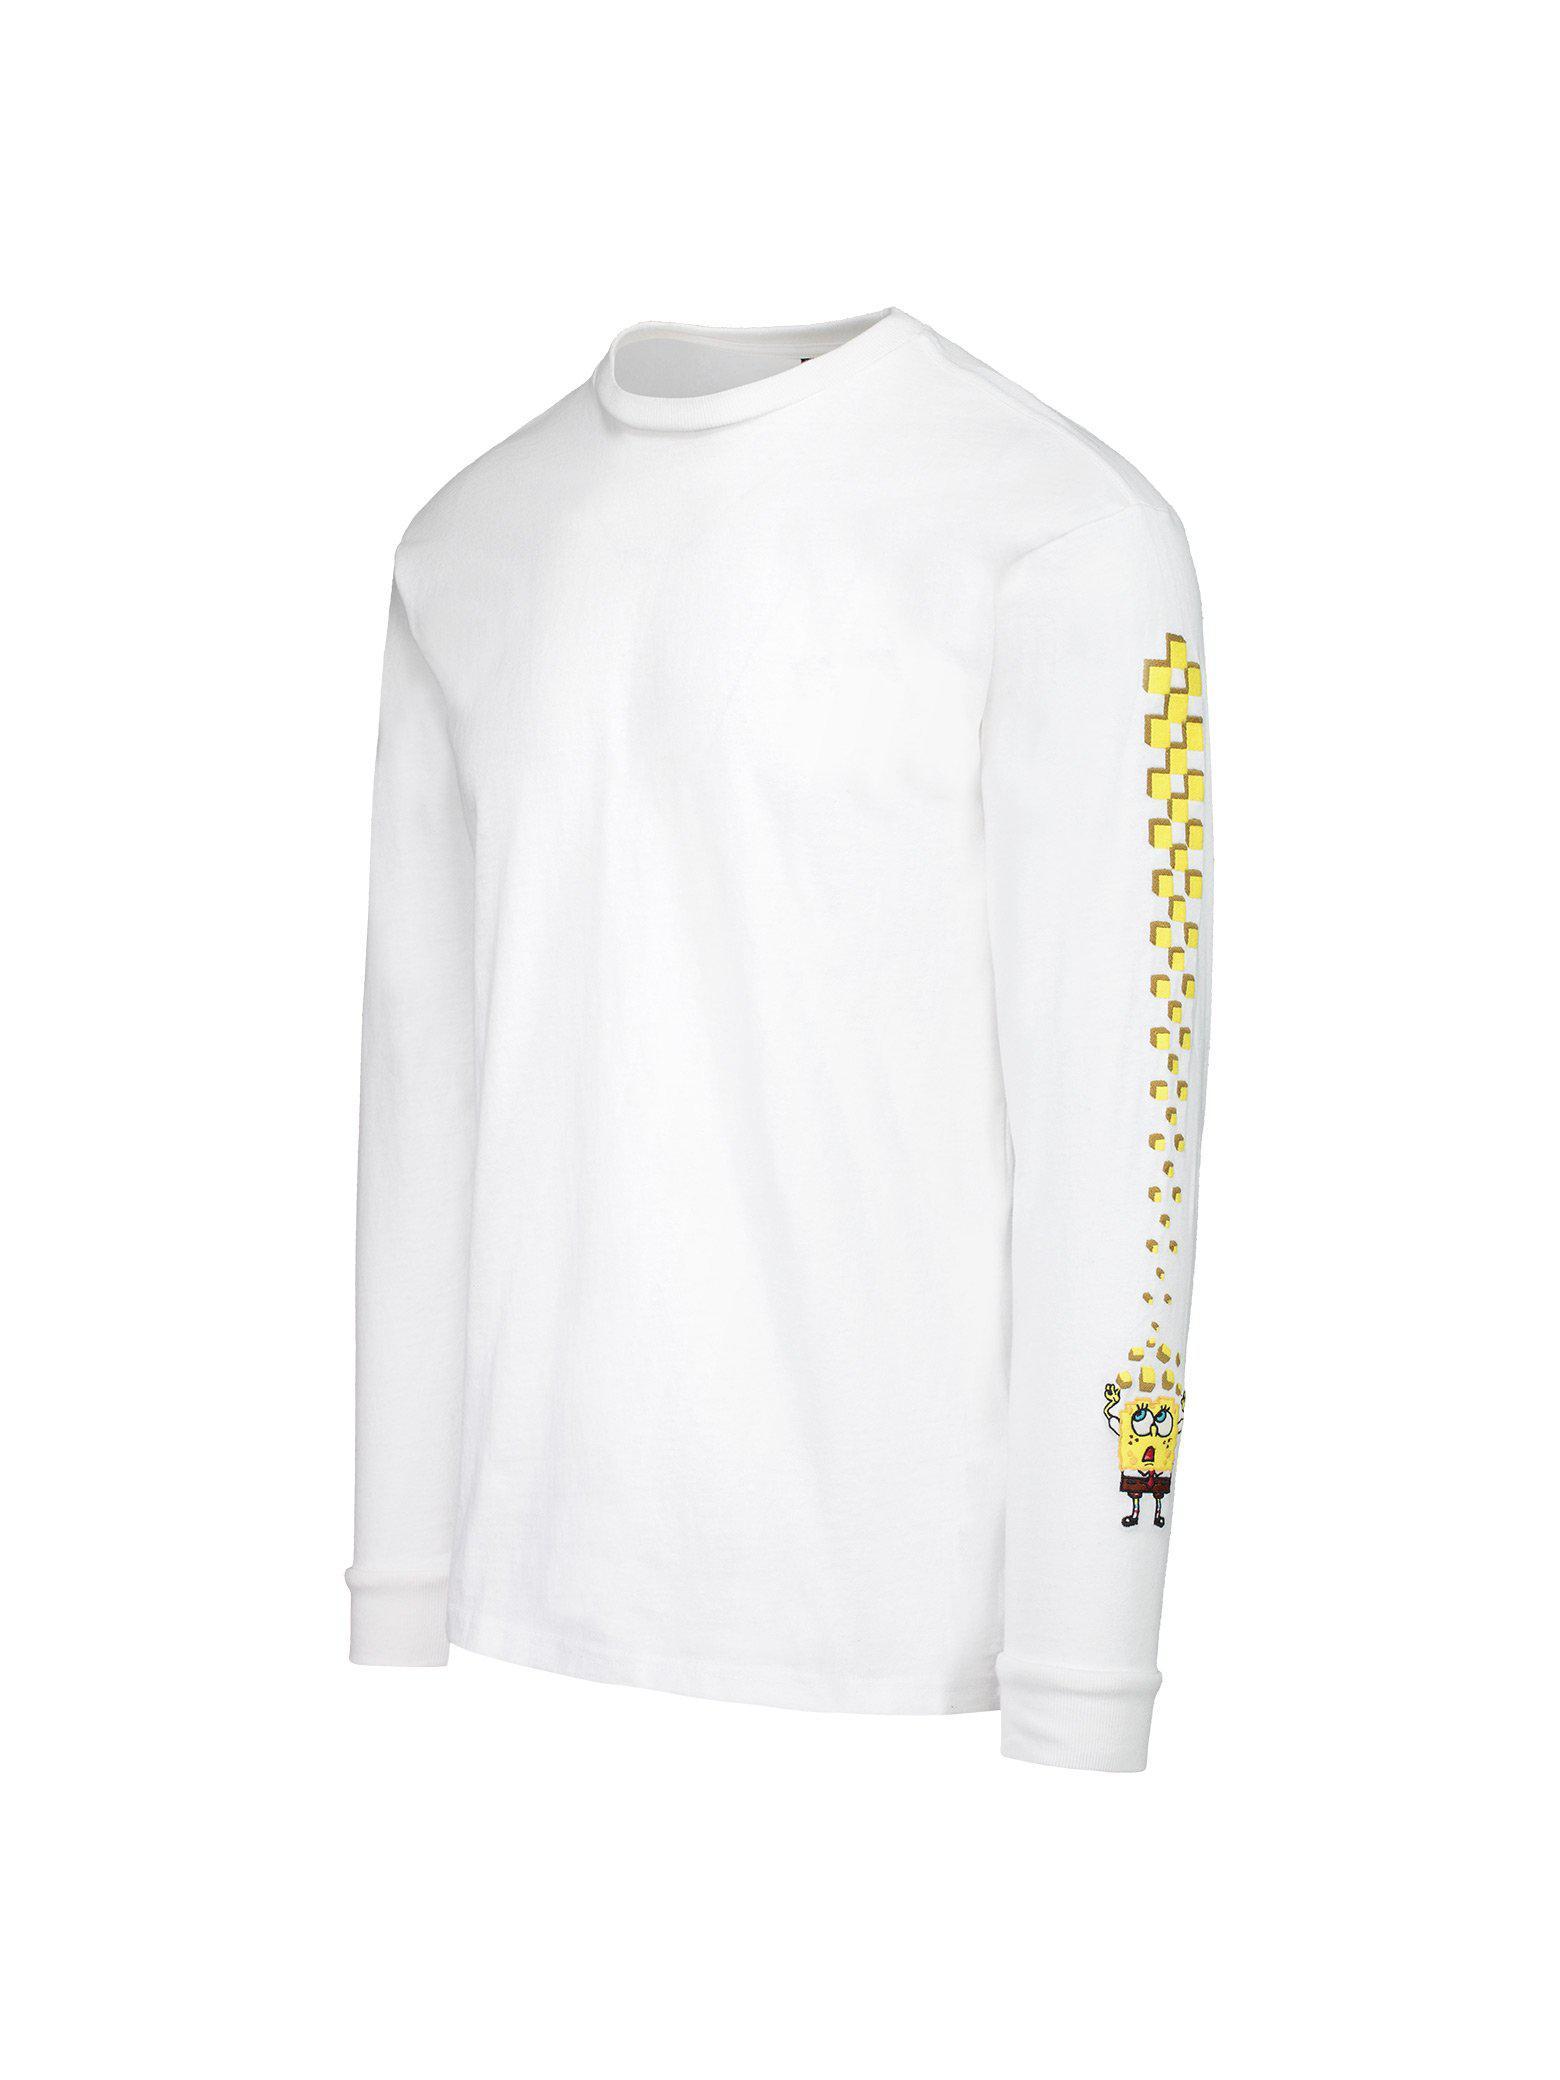 30109d220c3 Vans Mn Vans X Spongebob T-shirt in White for Men - Lyst